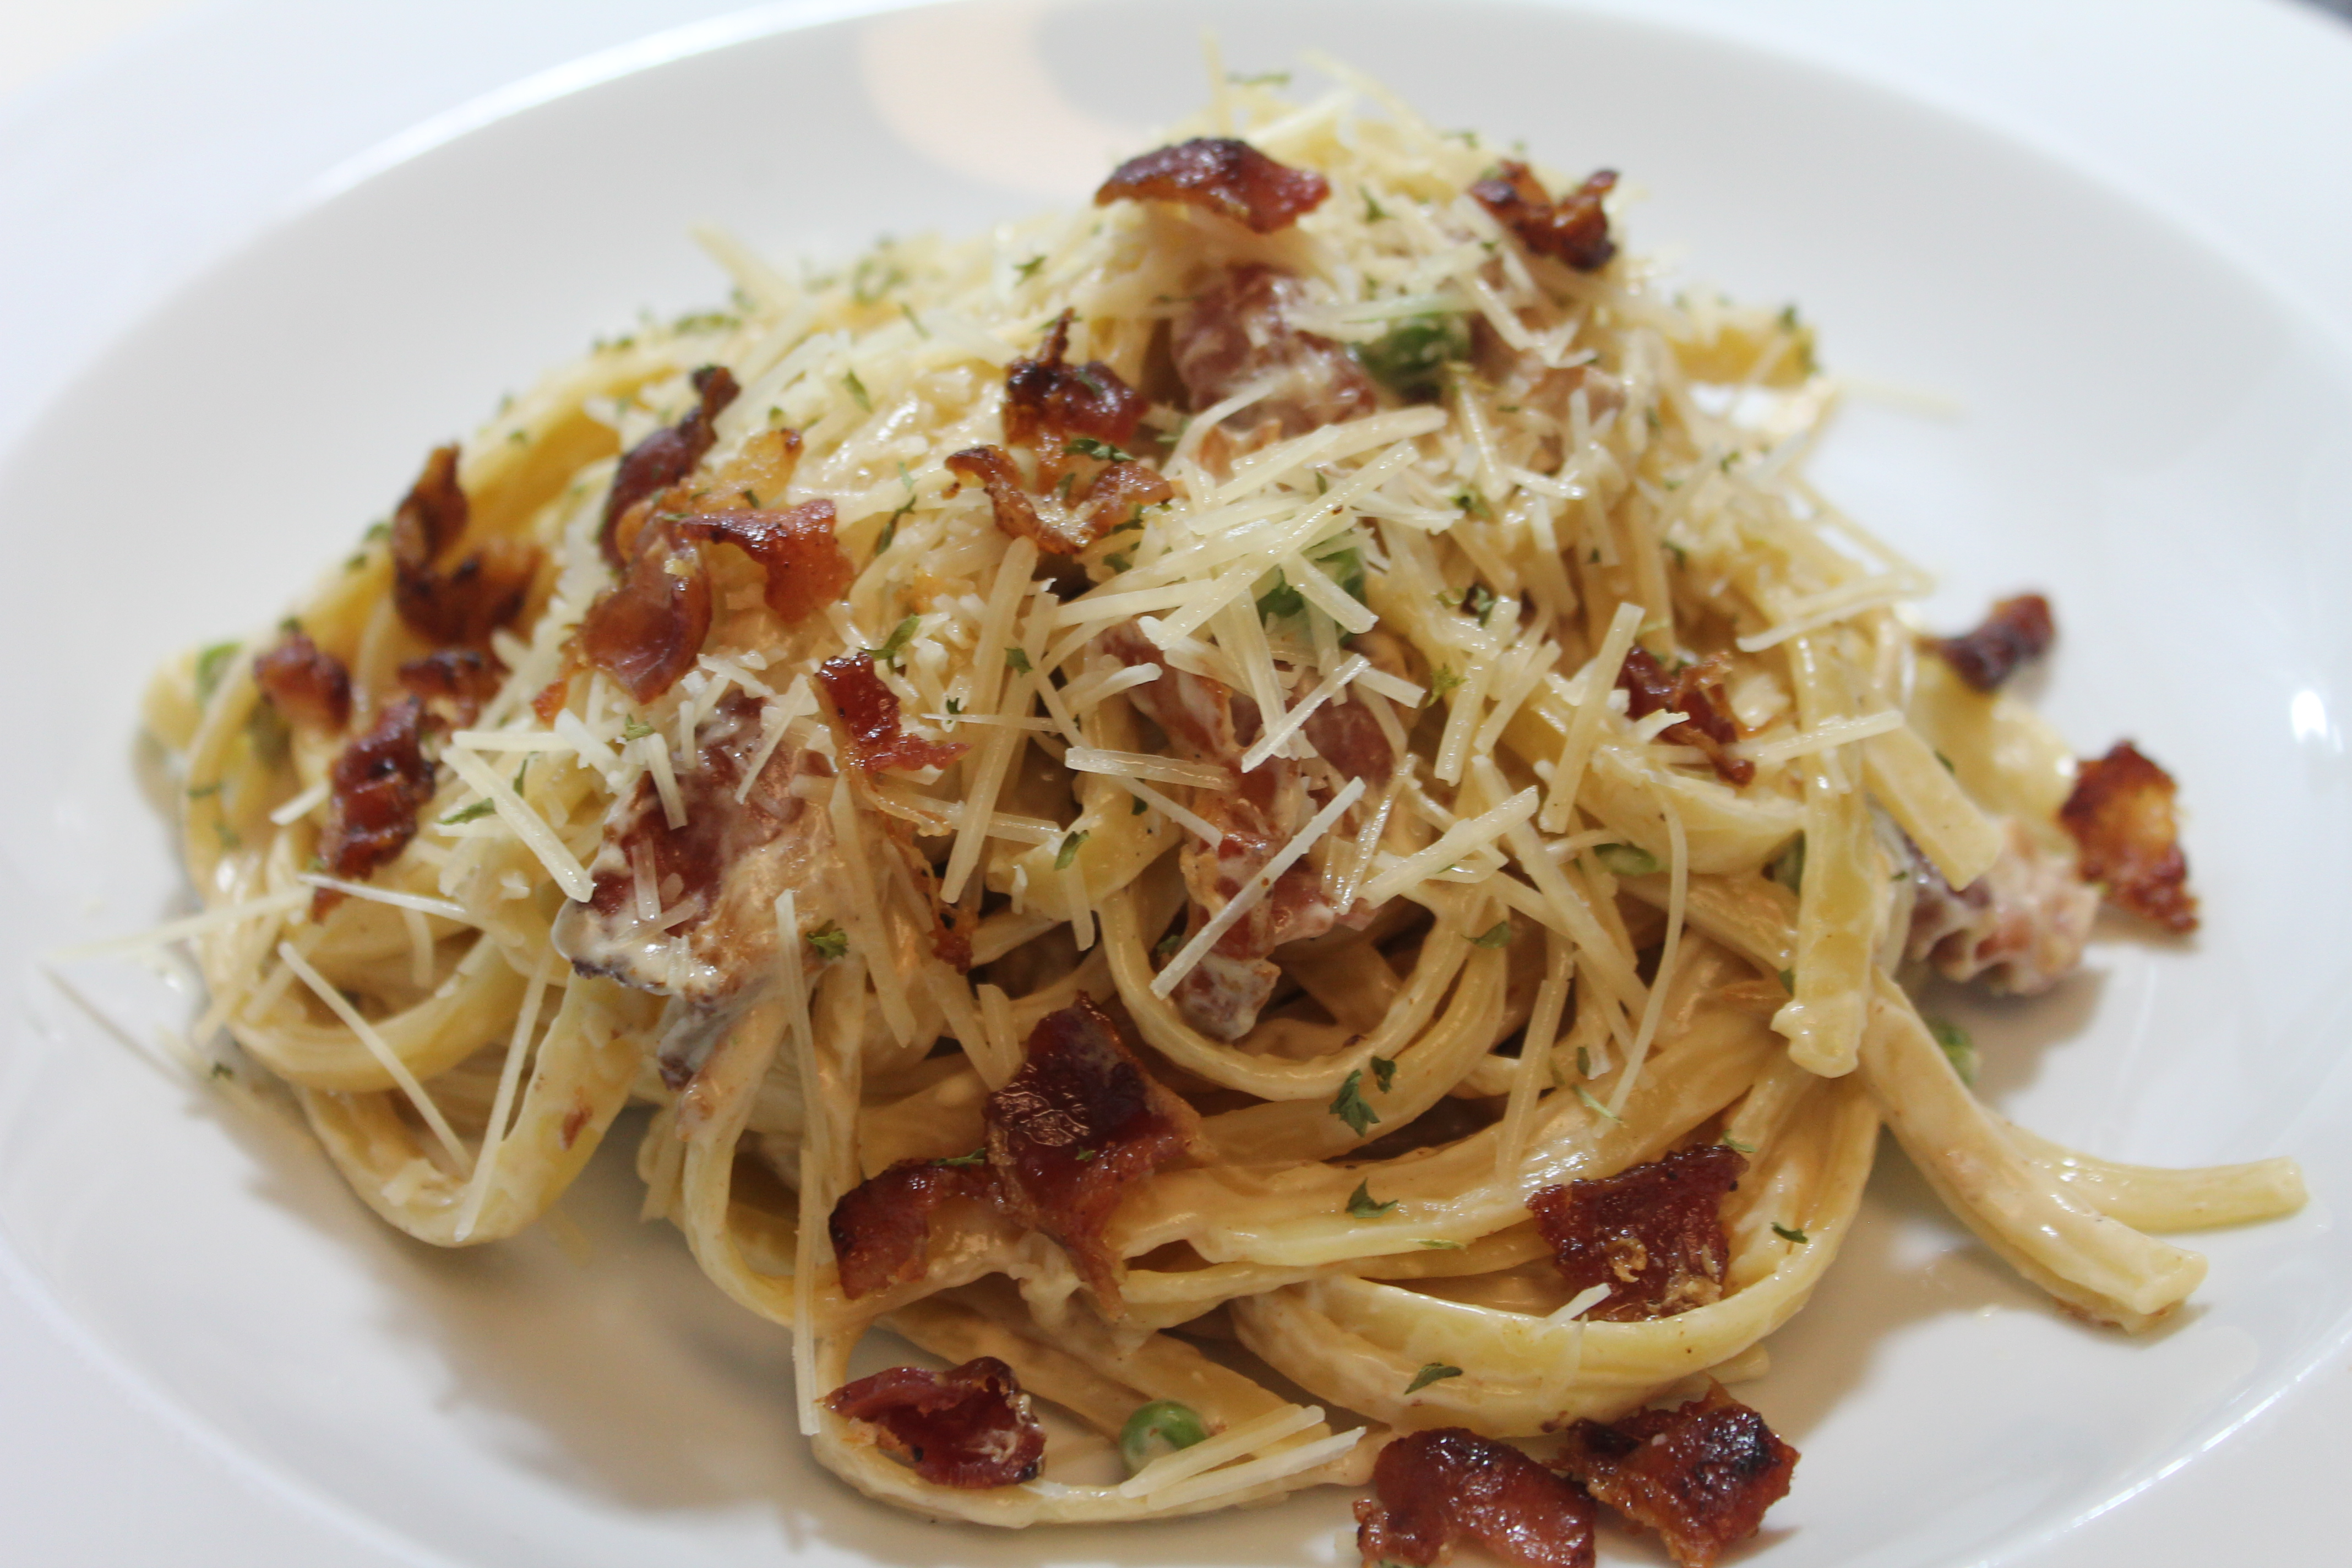 Fettuccine Alfredo Carbonara | I Heart Recipes